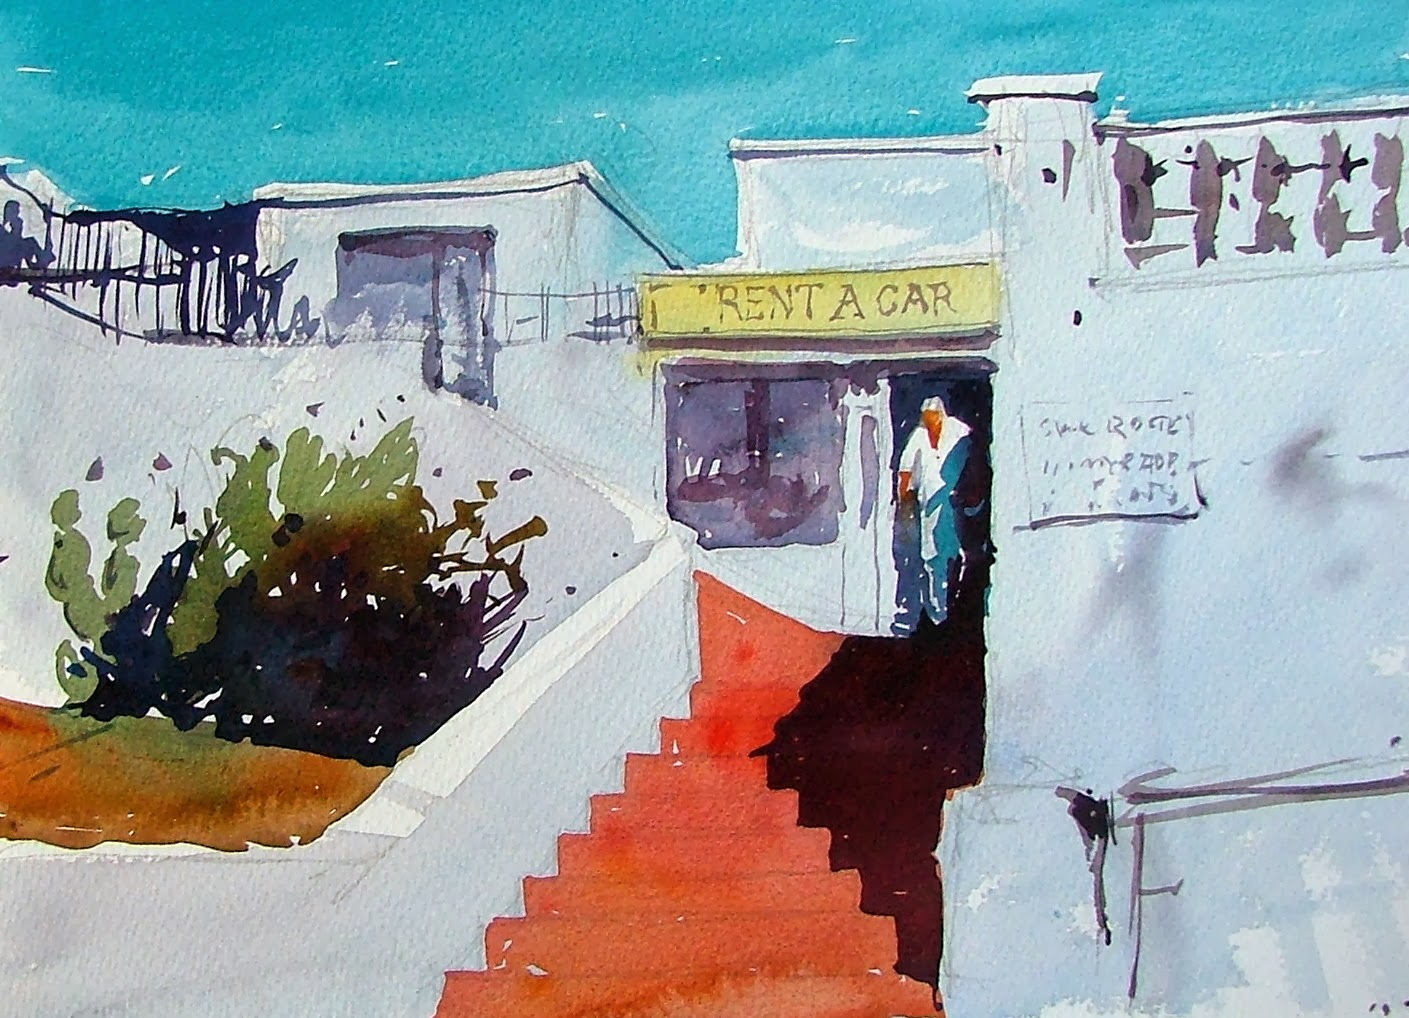 Tim wilmot watercolours september 2013 - Car rental puerto del carmen ...